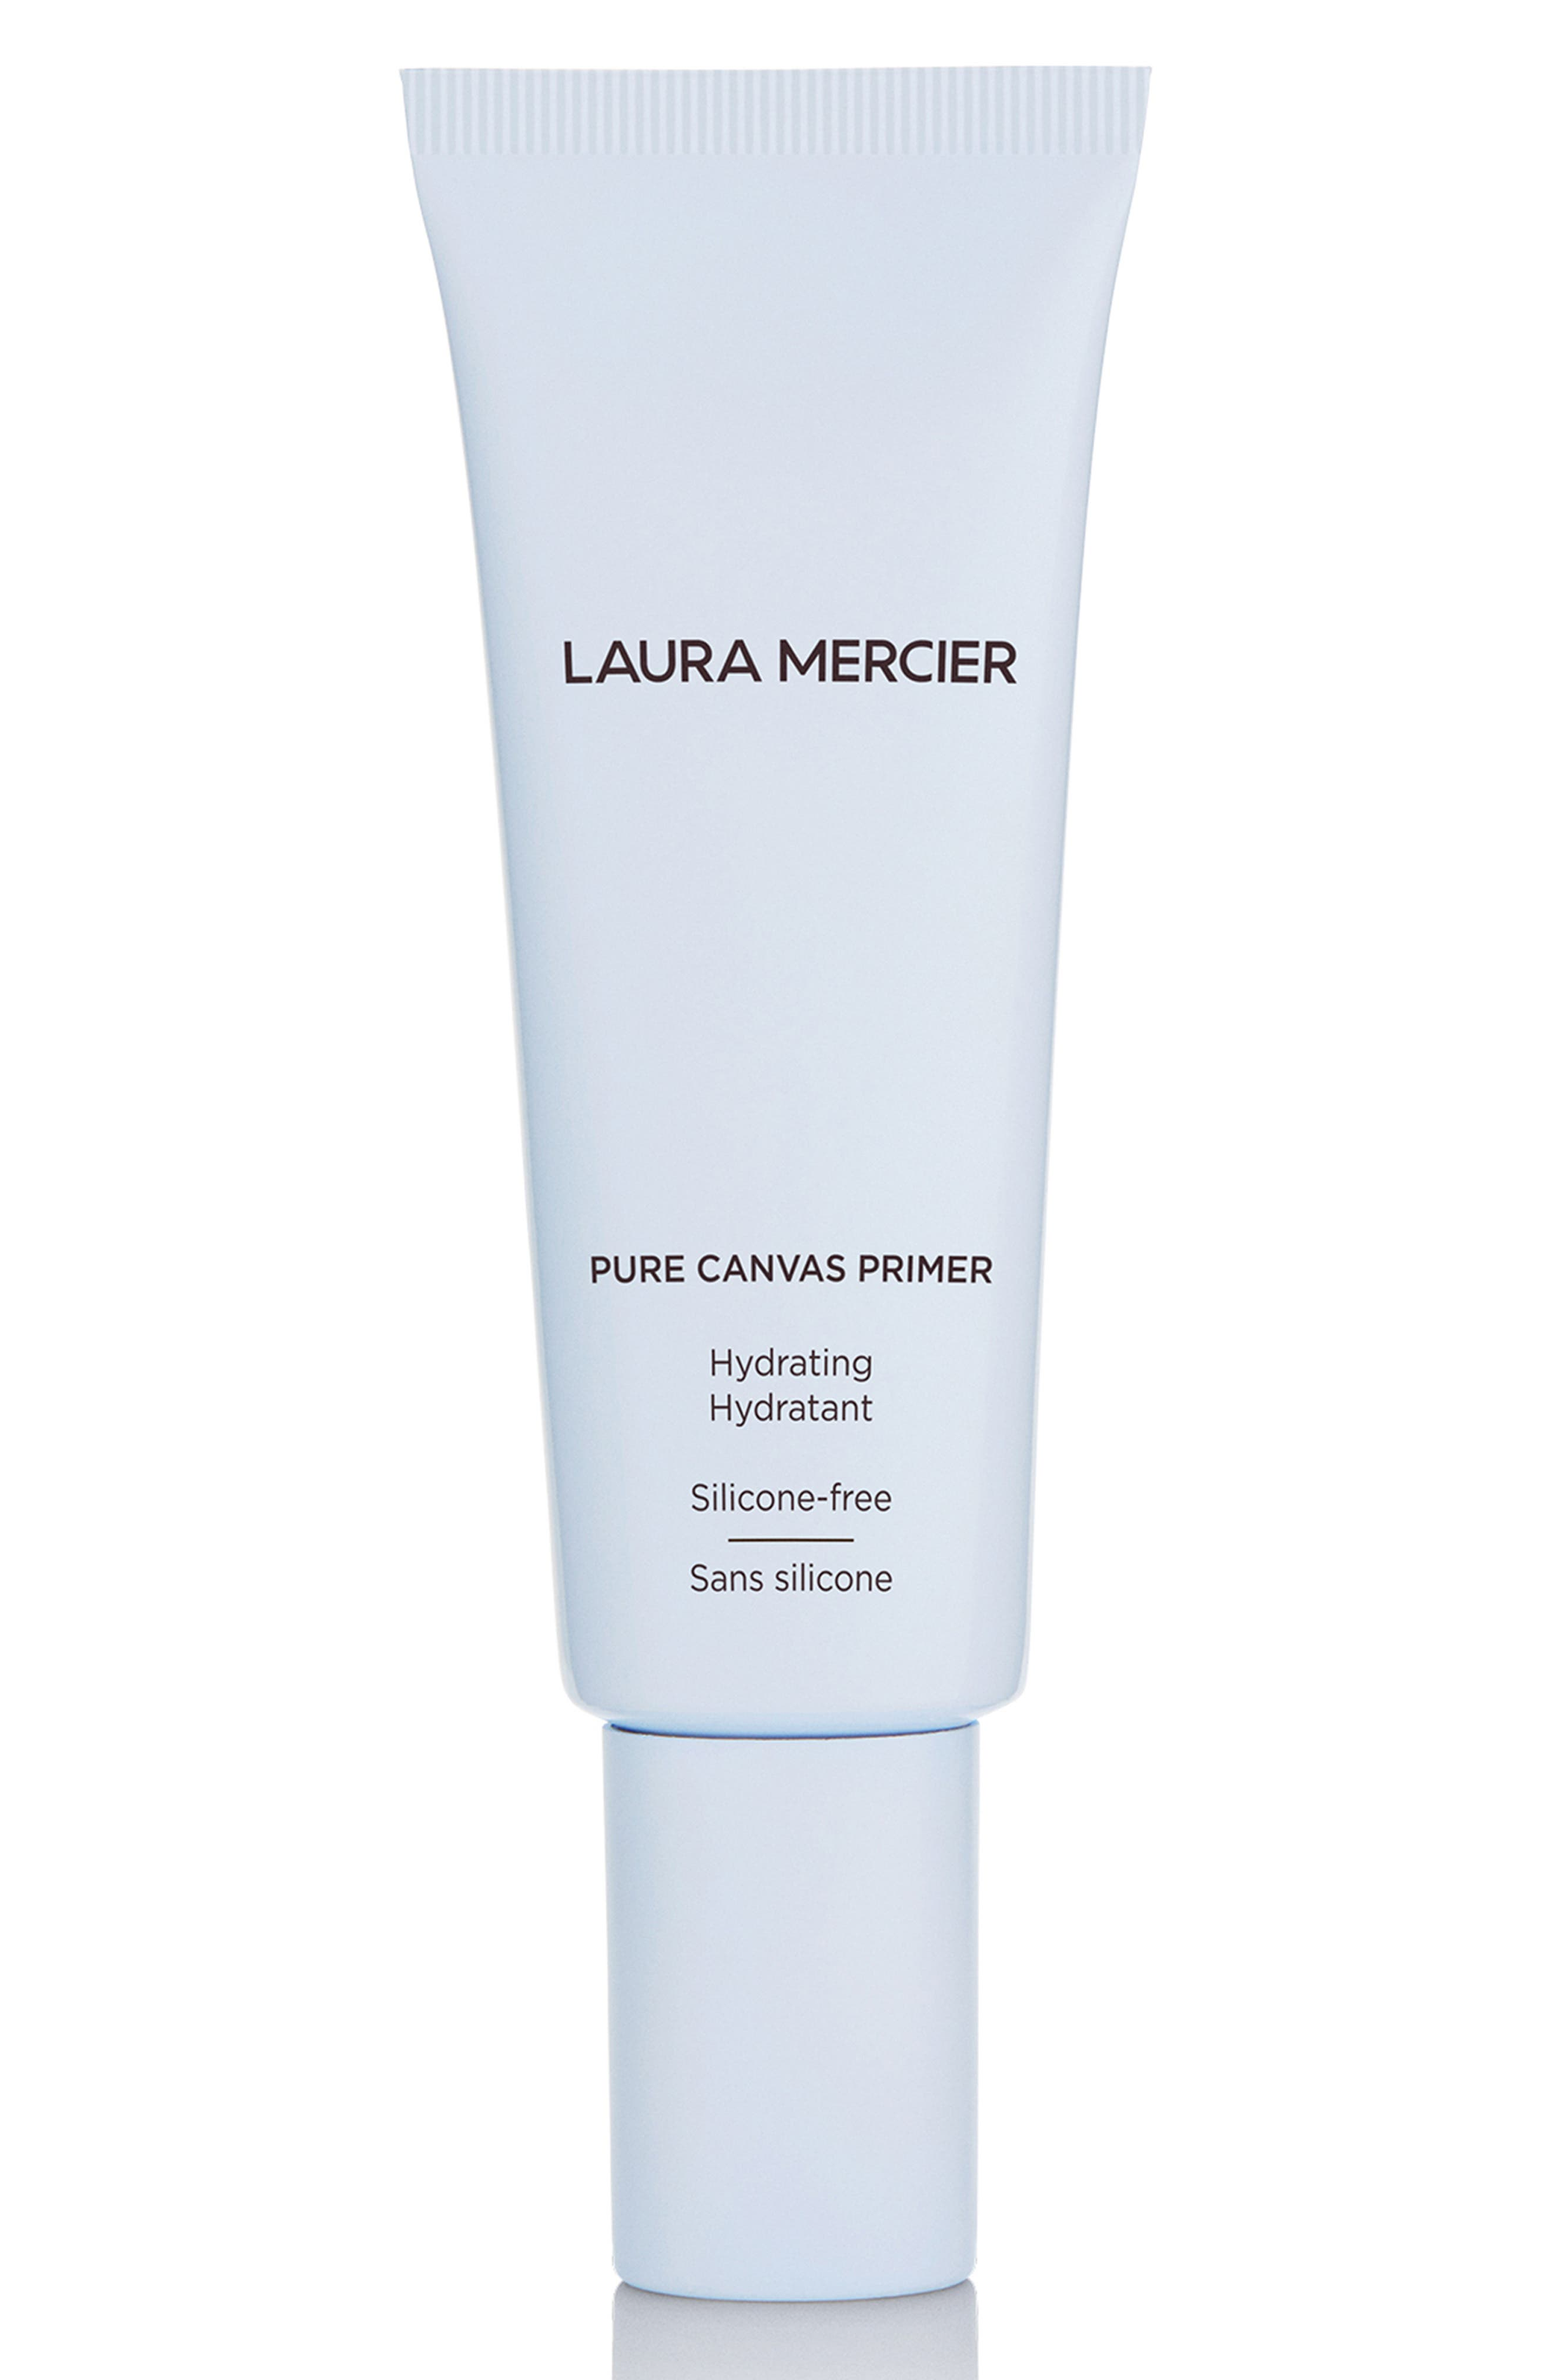 Image of Laura Mercier Pure Canvas Primer Mini - Hydrating